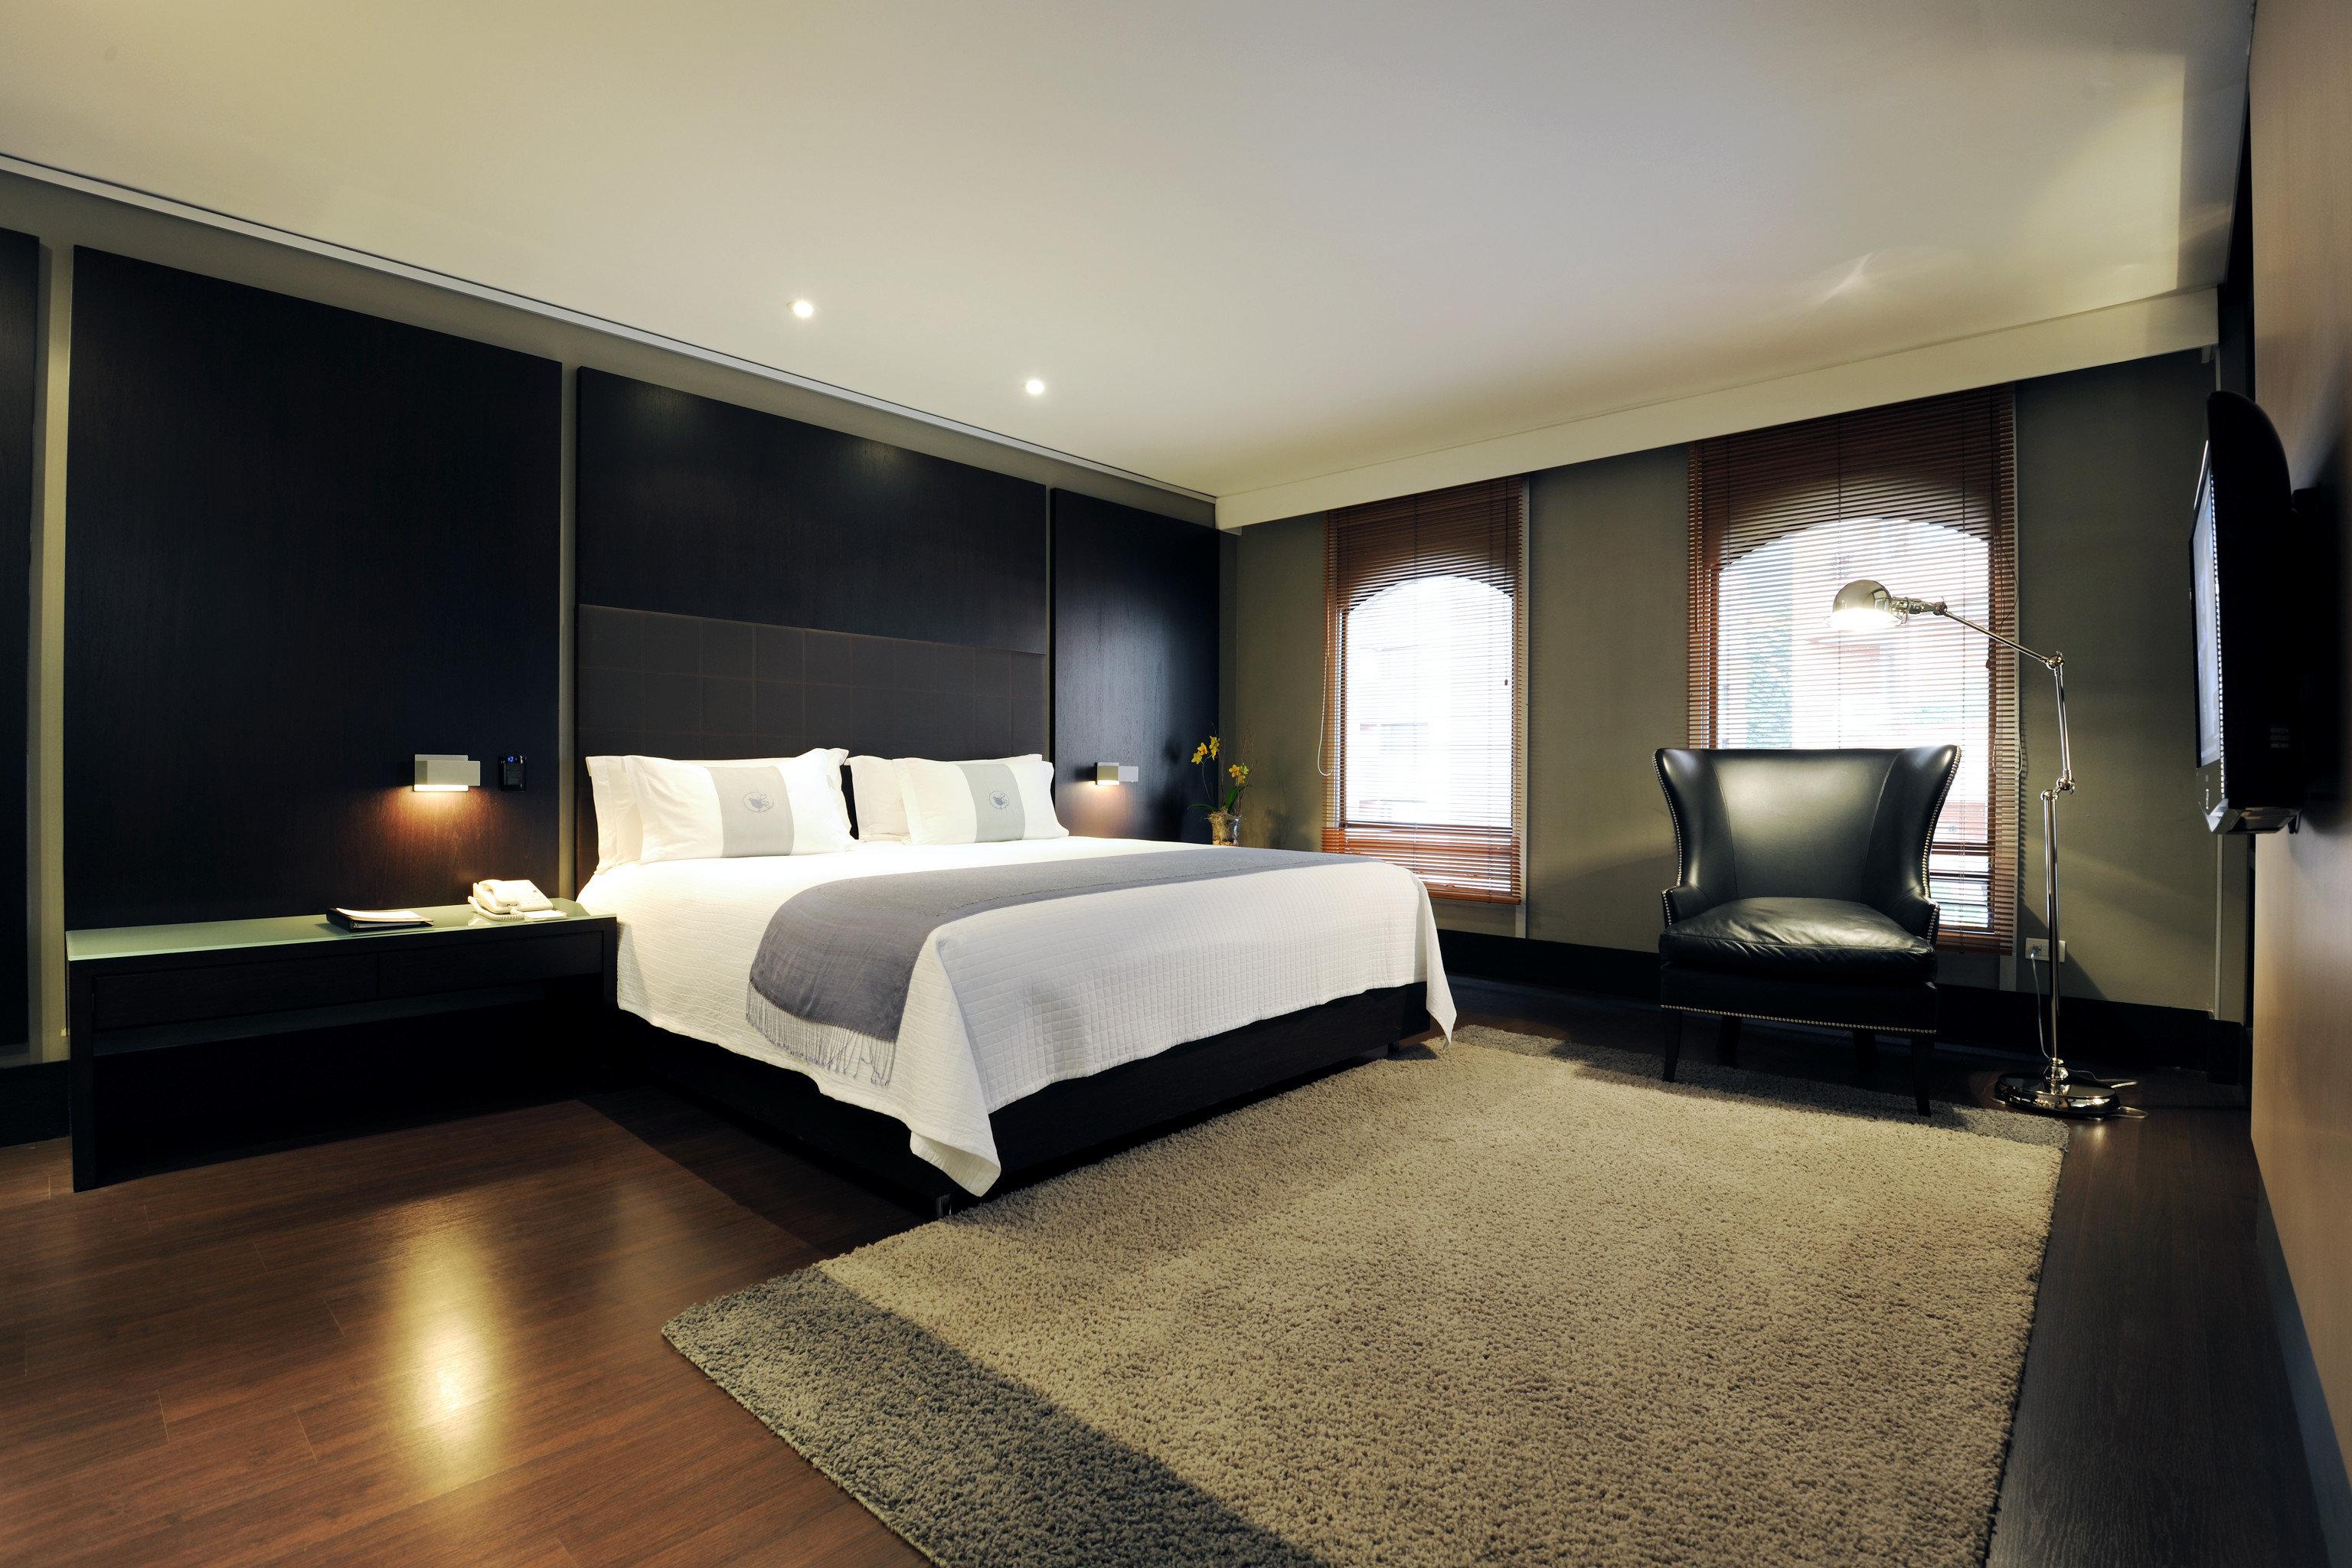 Bedroom Luxury Modern Scenic views Suite property living room home flat lamp